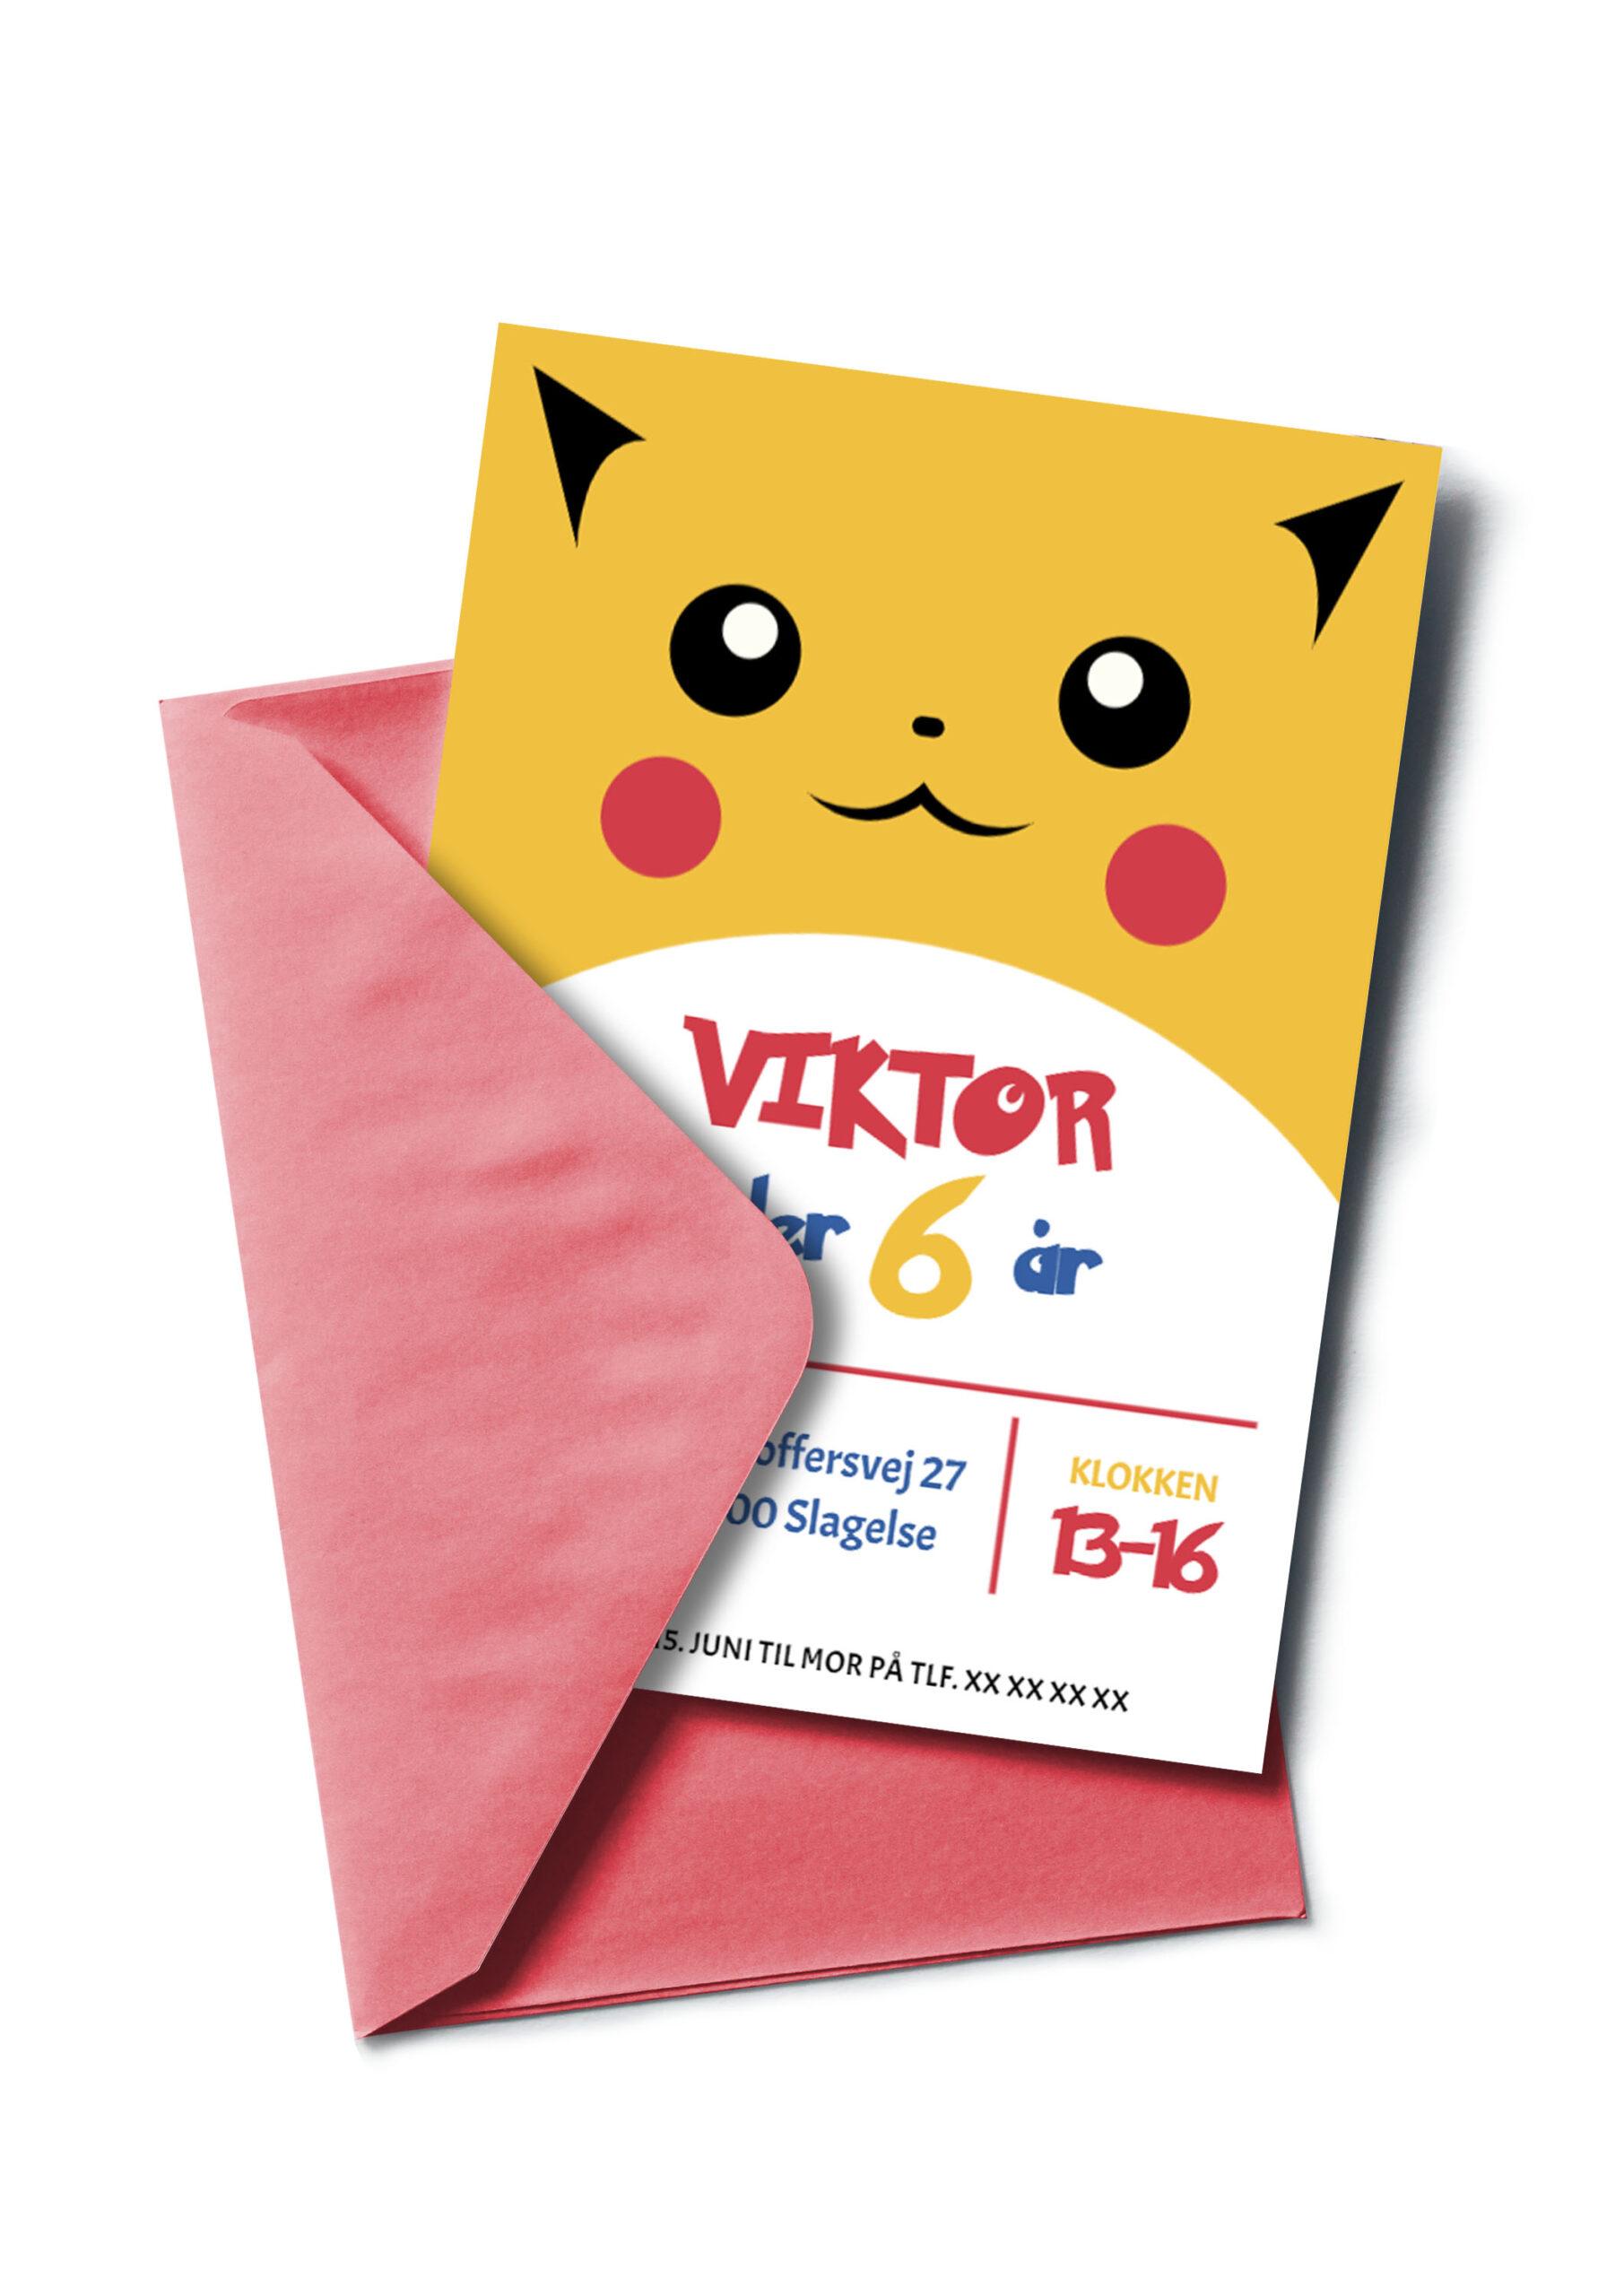 Pokémon invitation - Pikachu